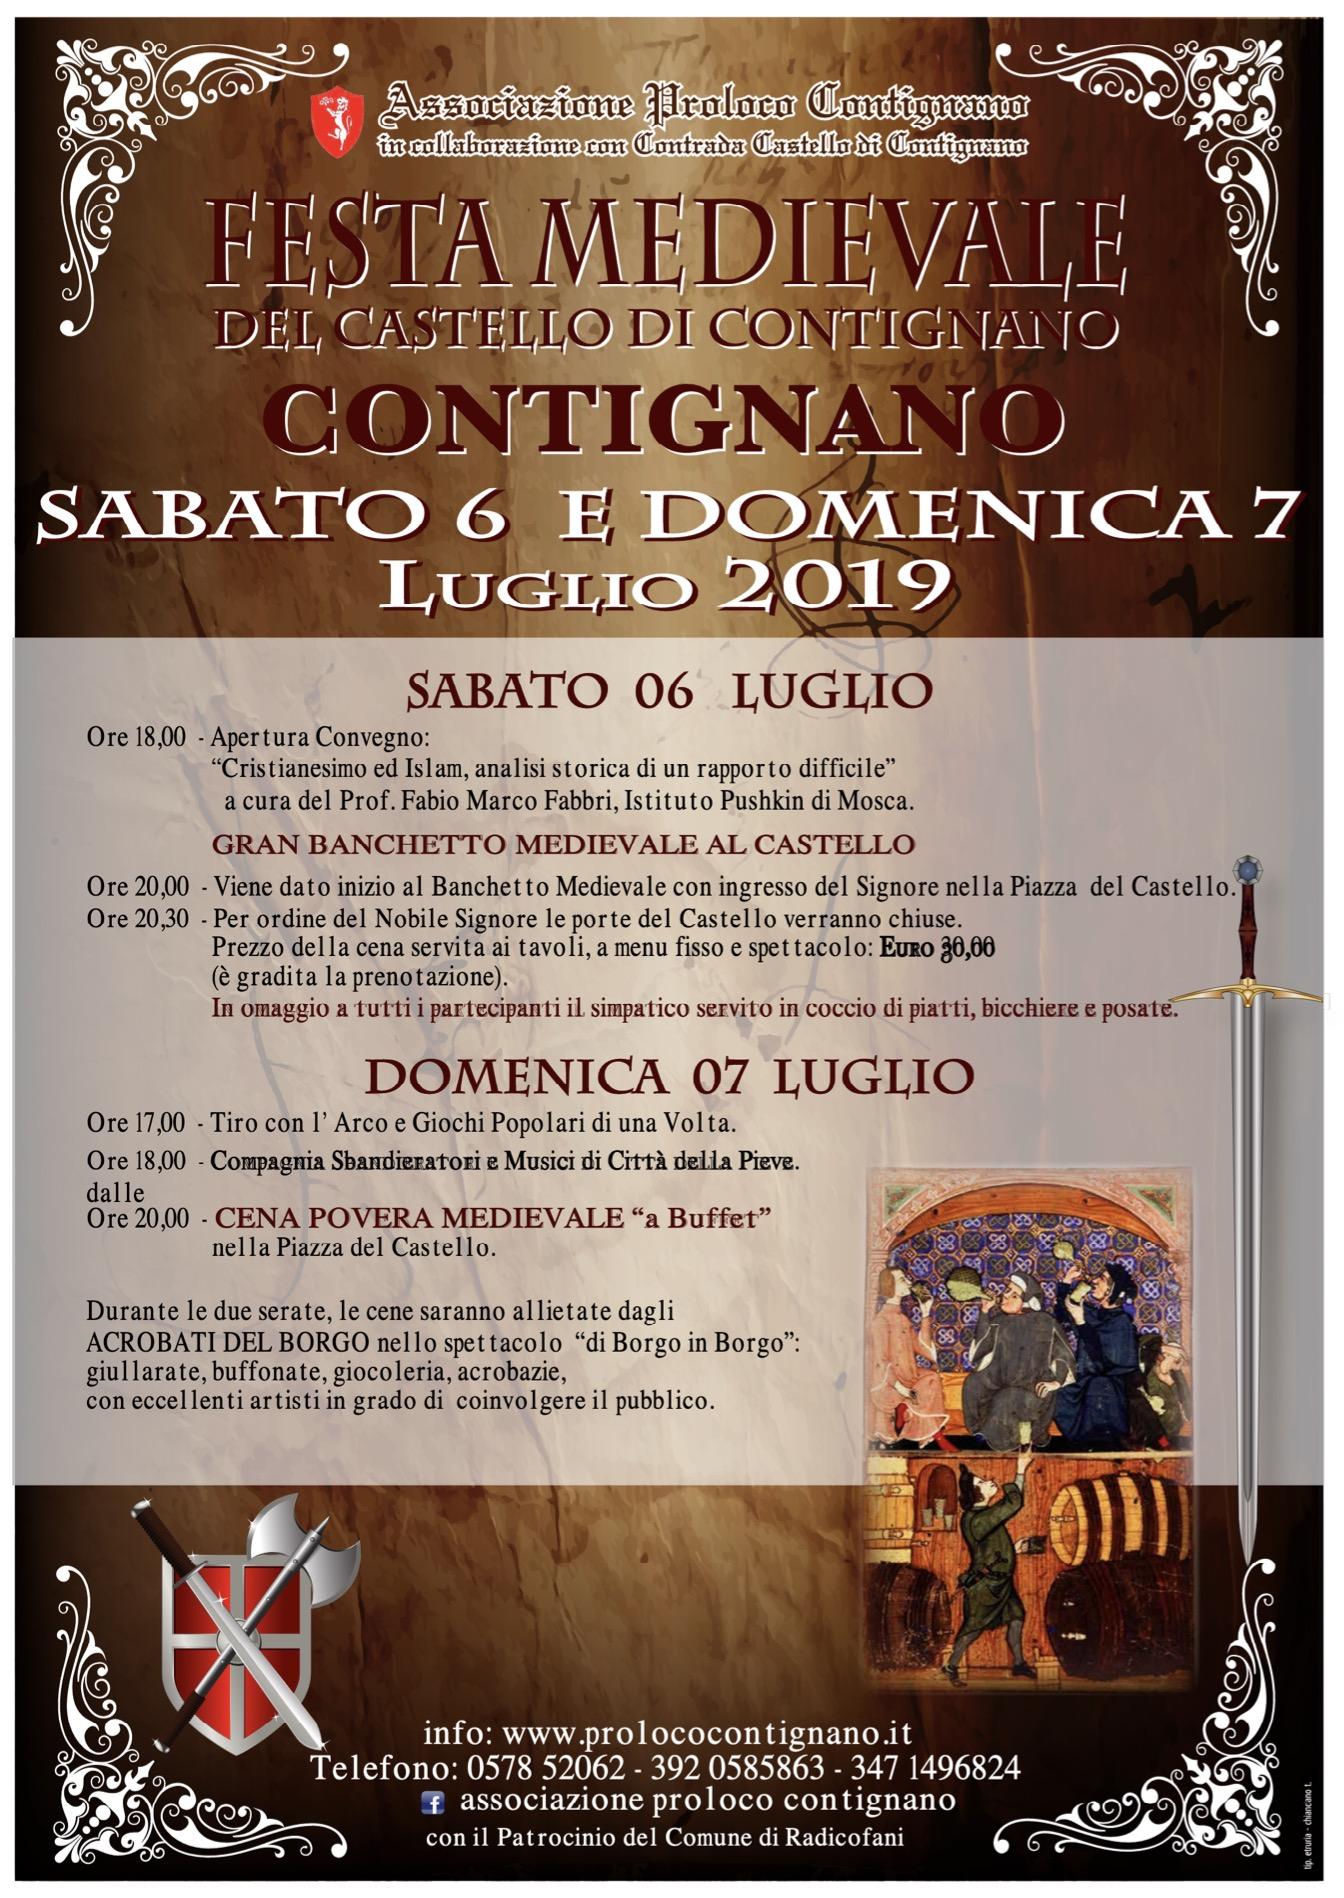 Locandina Festa Medievale - ed. 2016